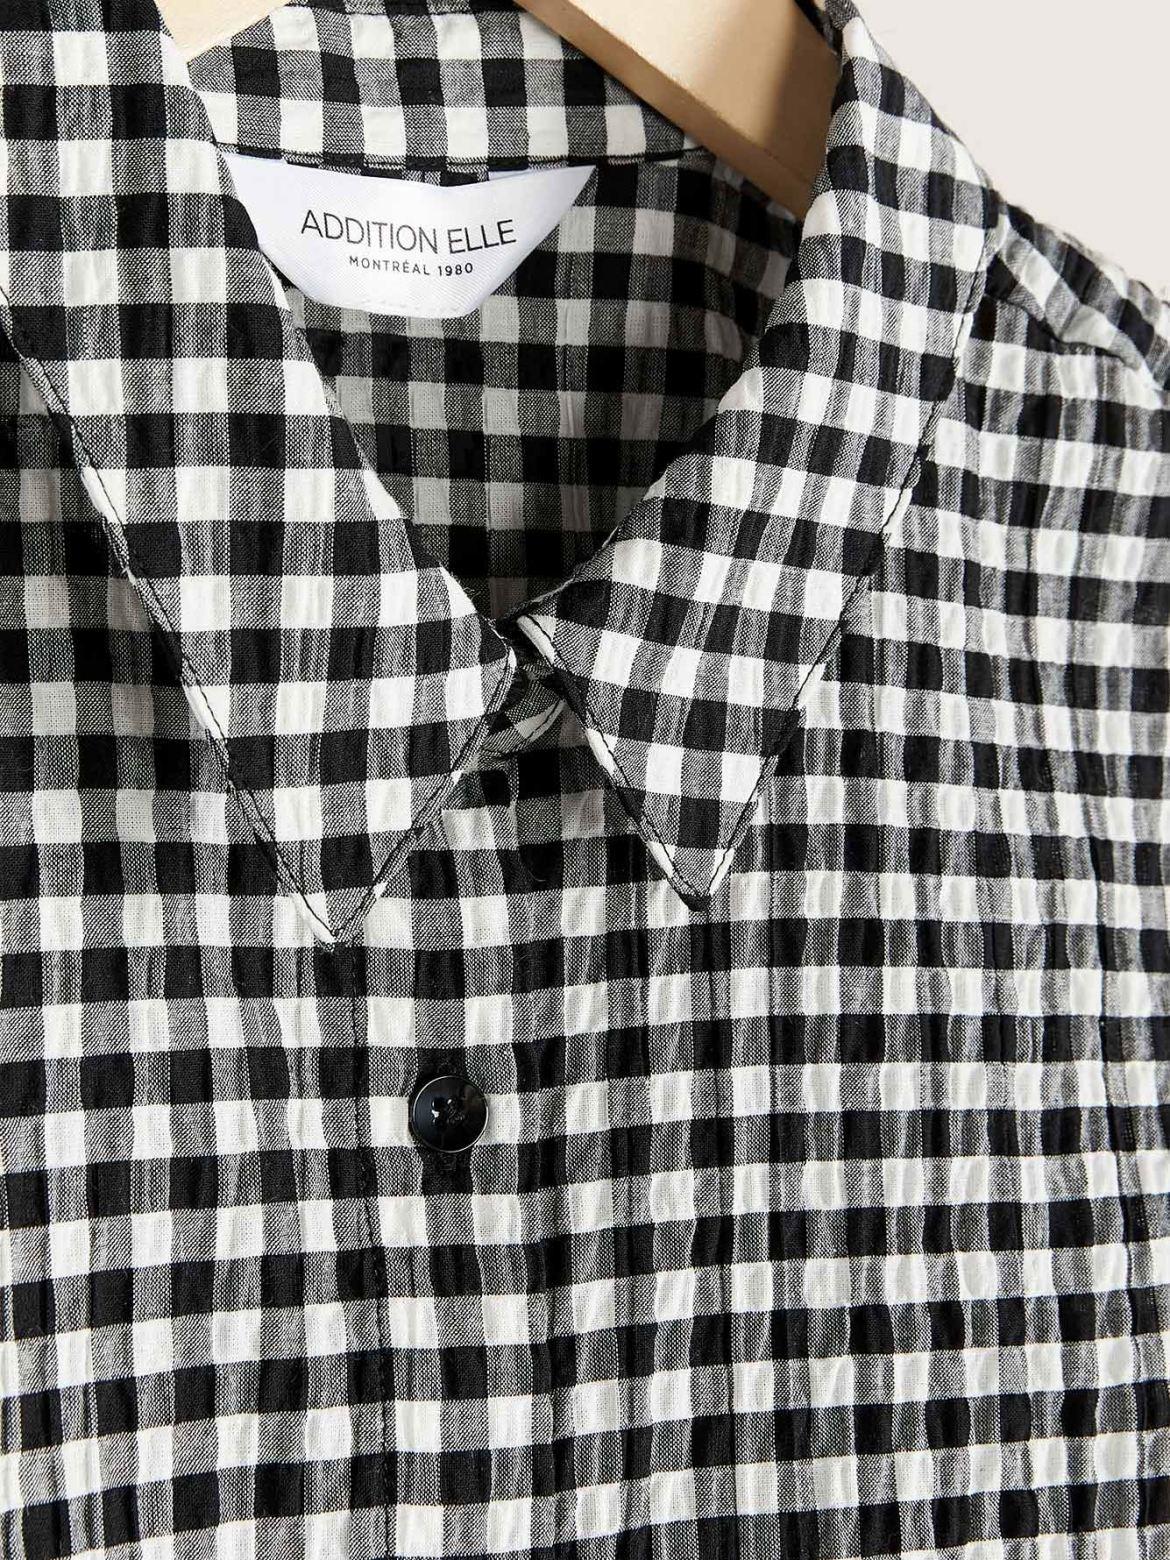 Sleeveless Gingham Shirt - Addition Elle